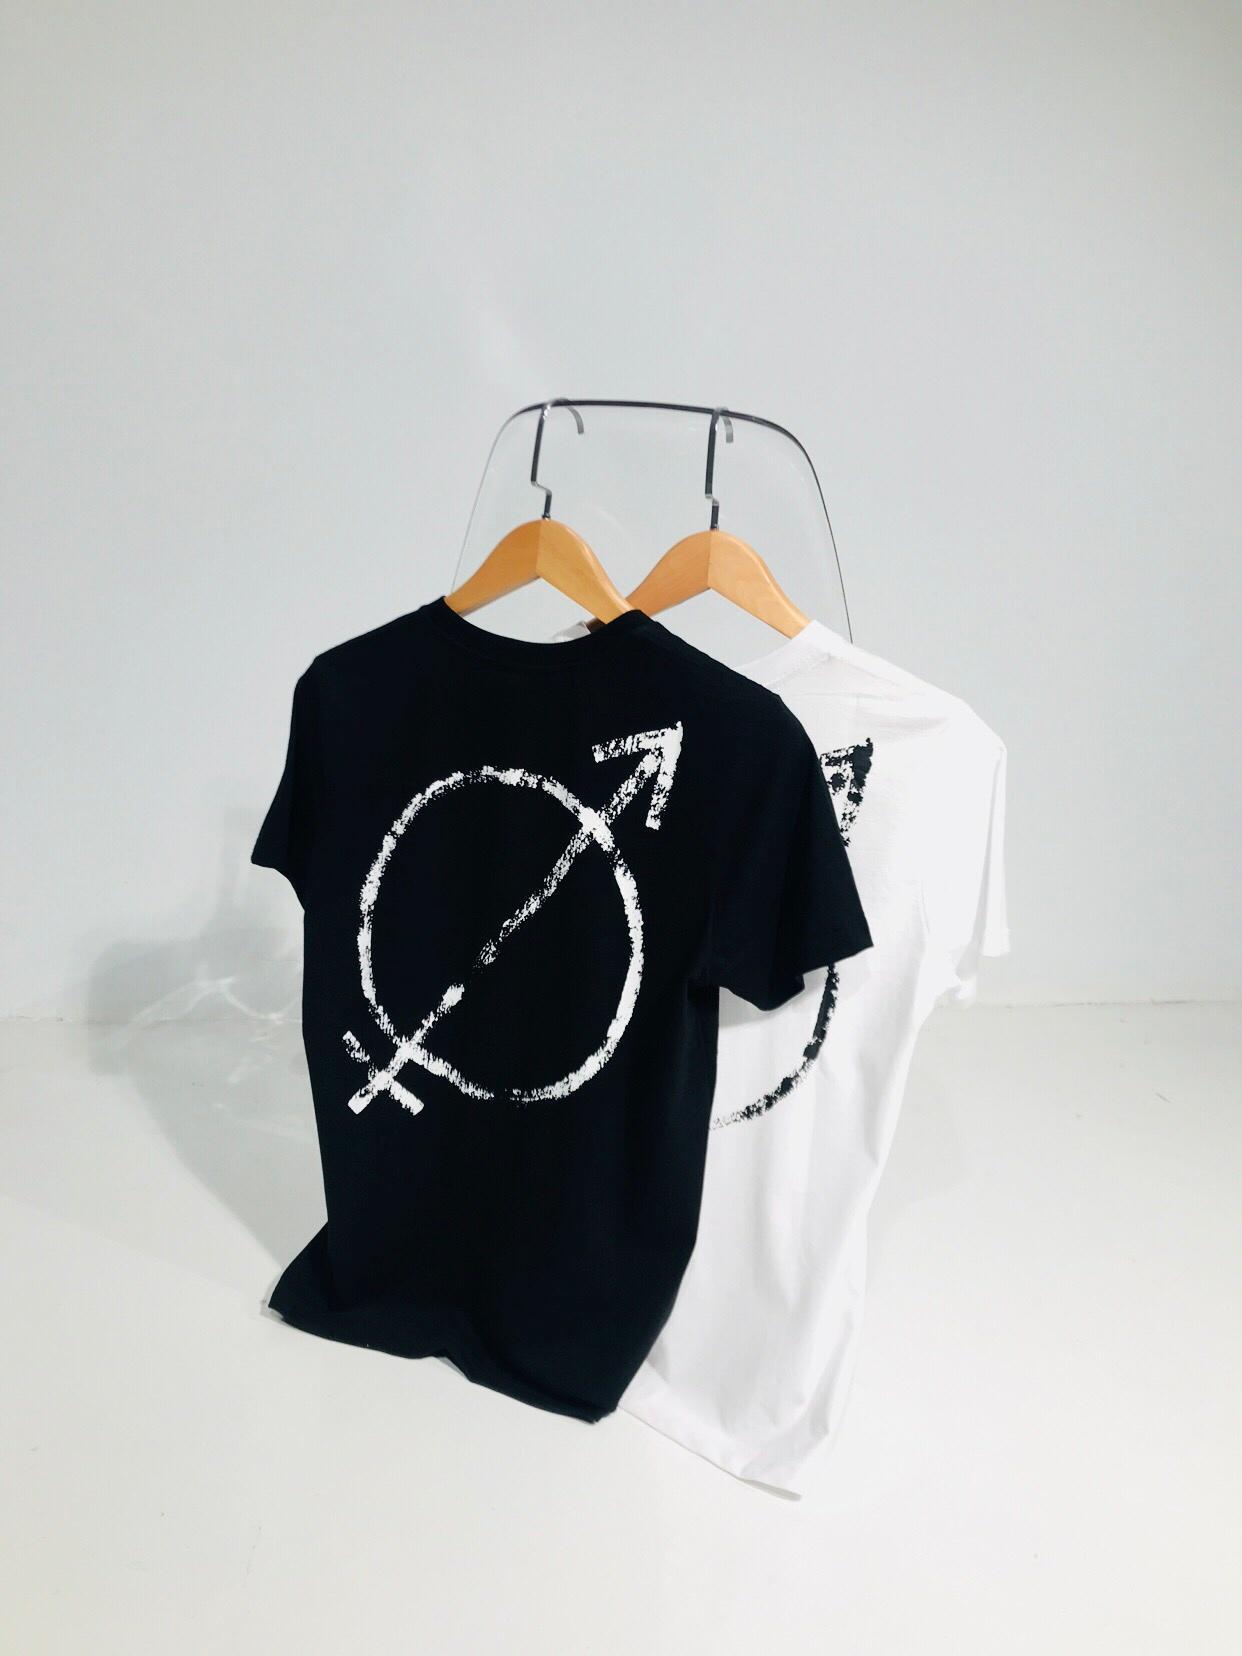 Balenciaga バレンシアガ カップル Tシャツ 通販専門店 国内発送代引き